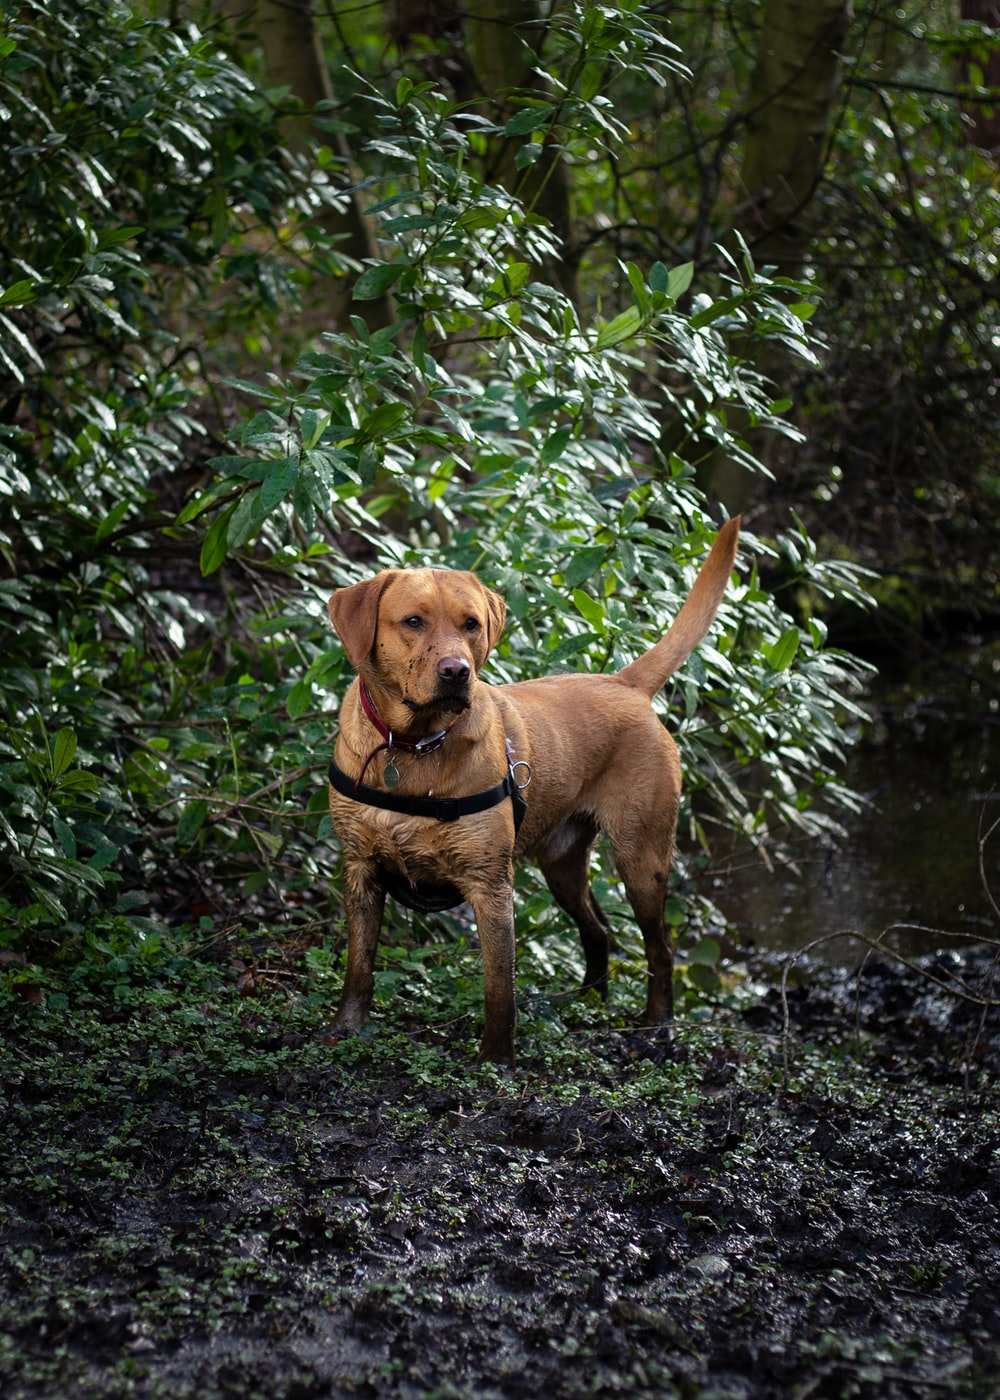 adult short-coated brown dog near green leaf plant